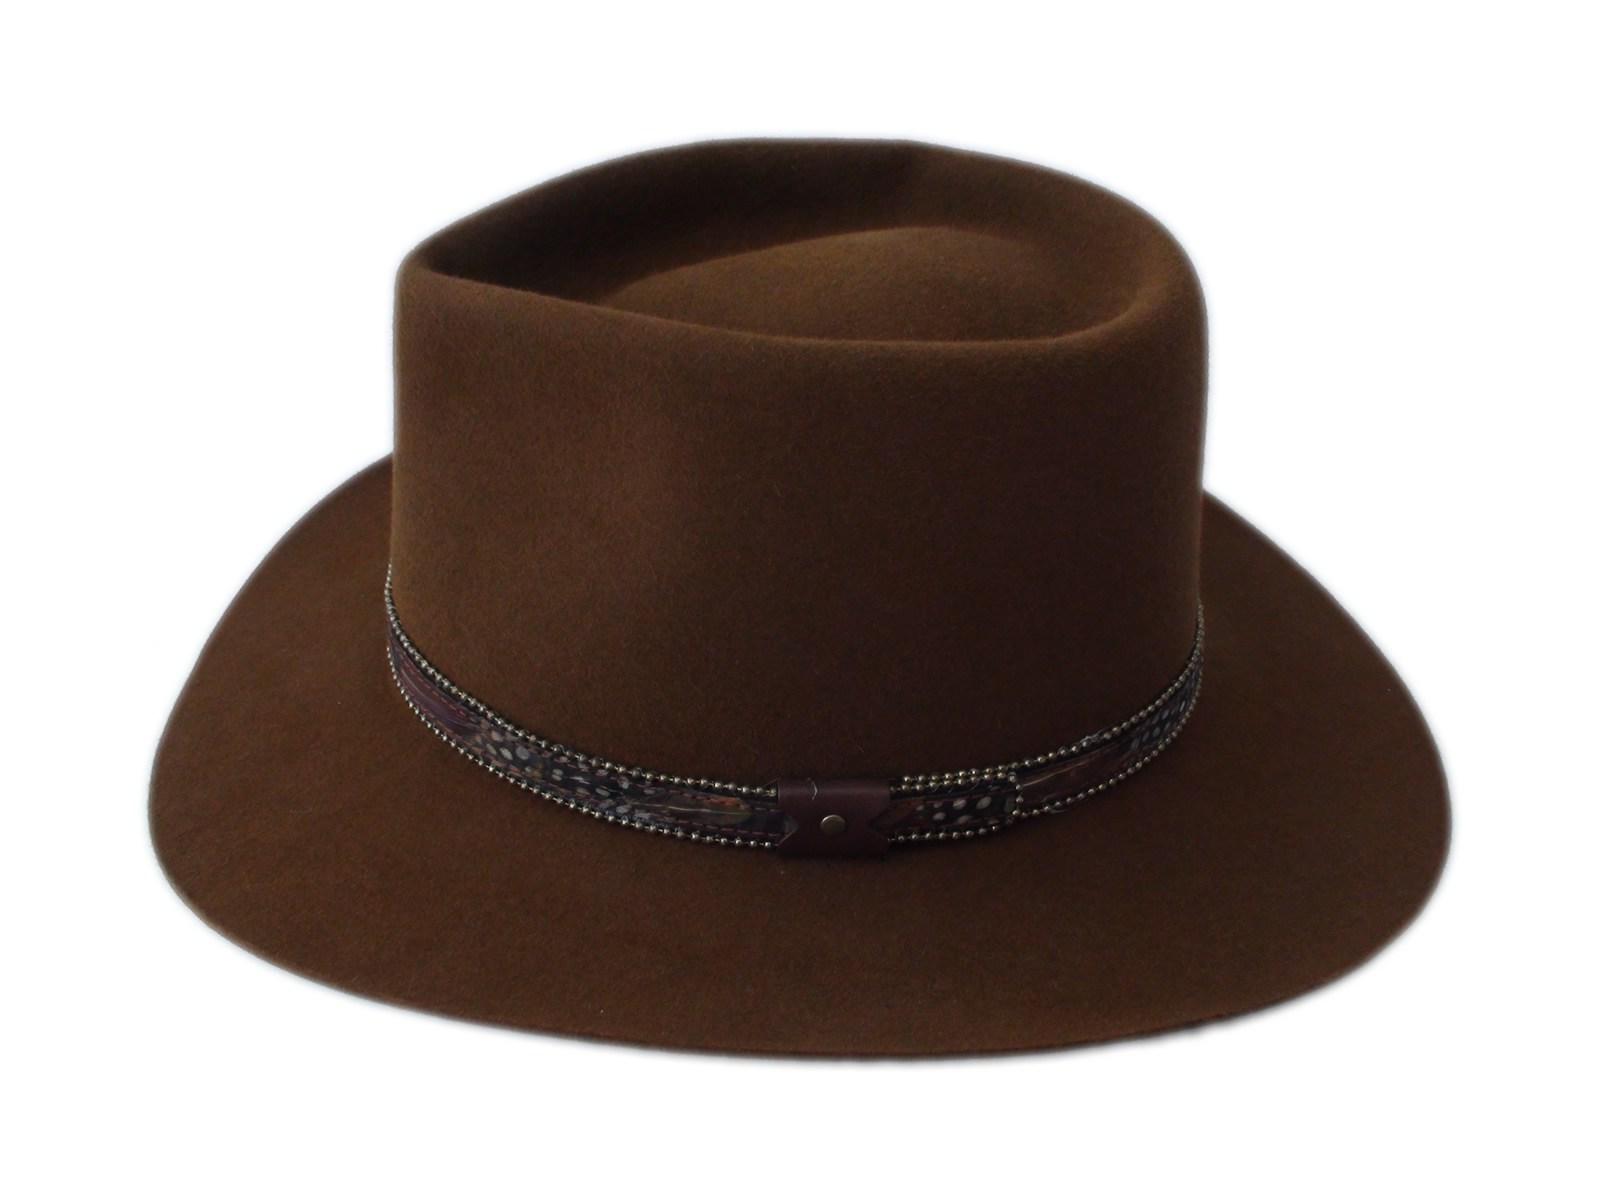 1600x1200 Smithbilt Hats Brown Fur Felt Western Cowboy Hat